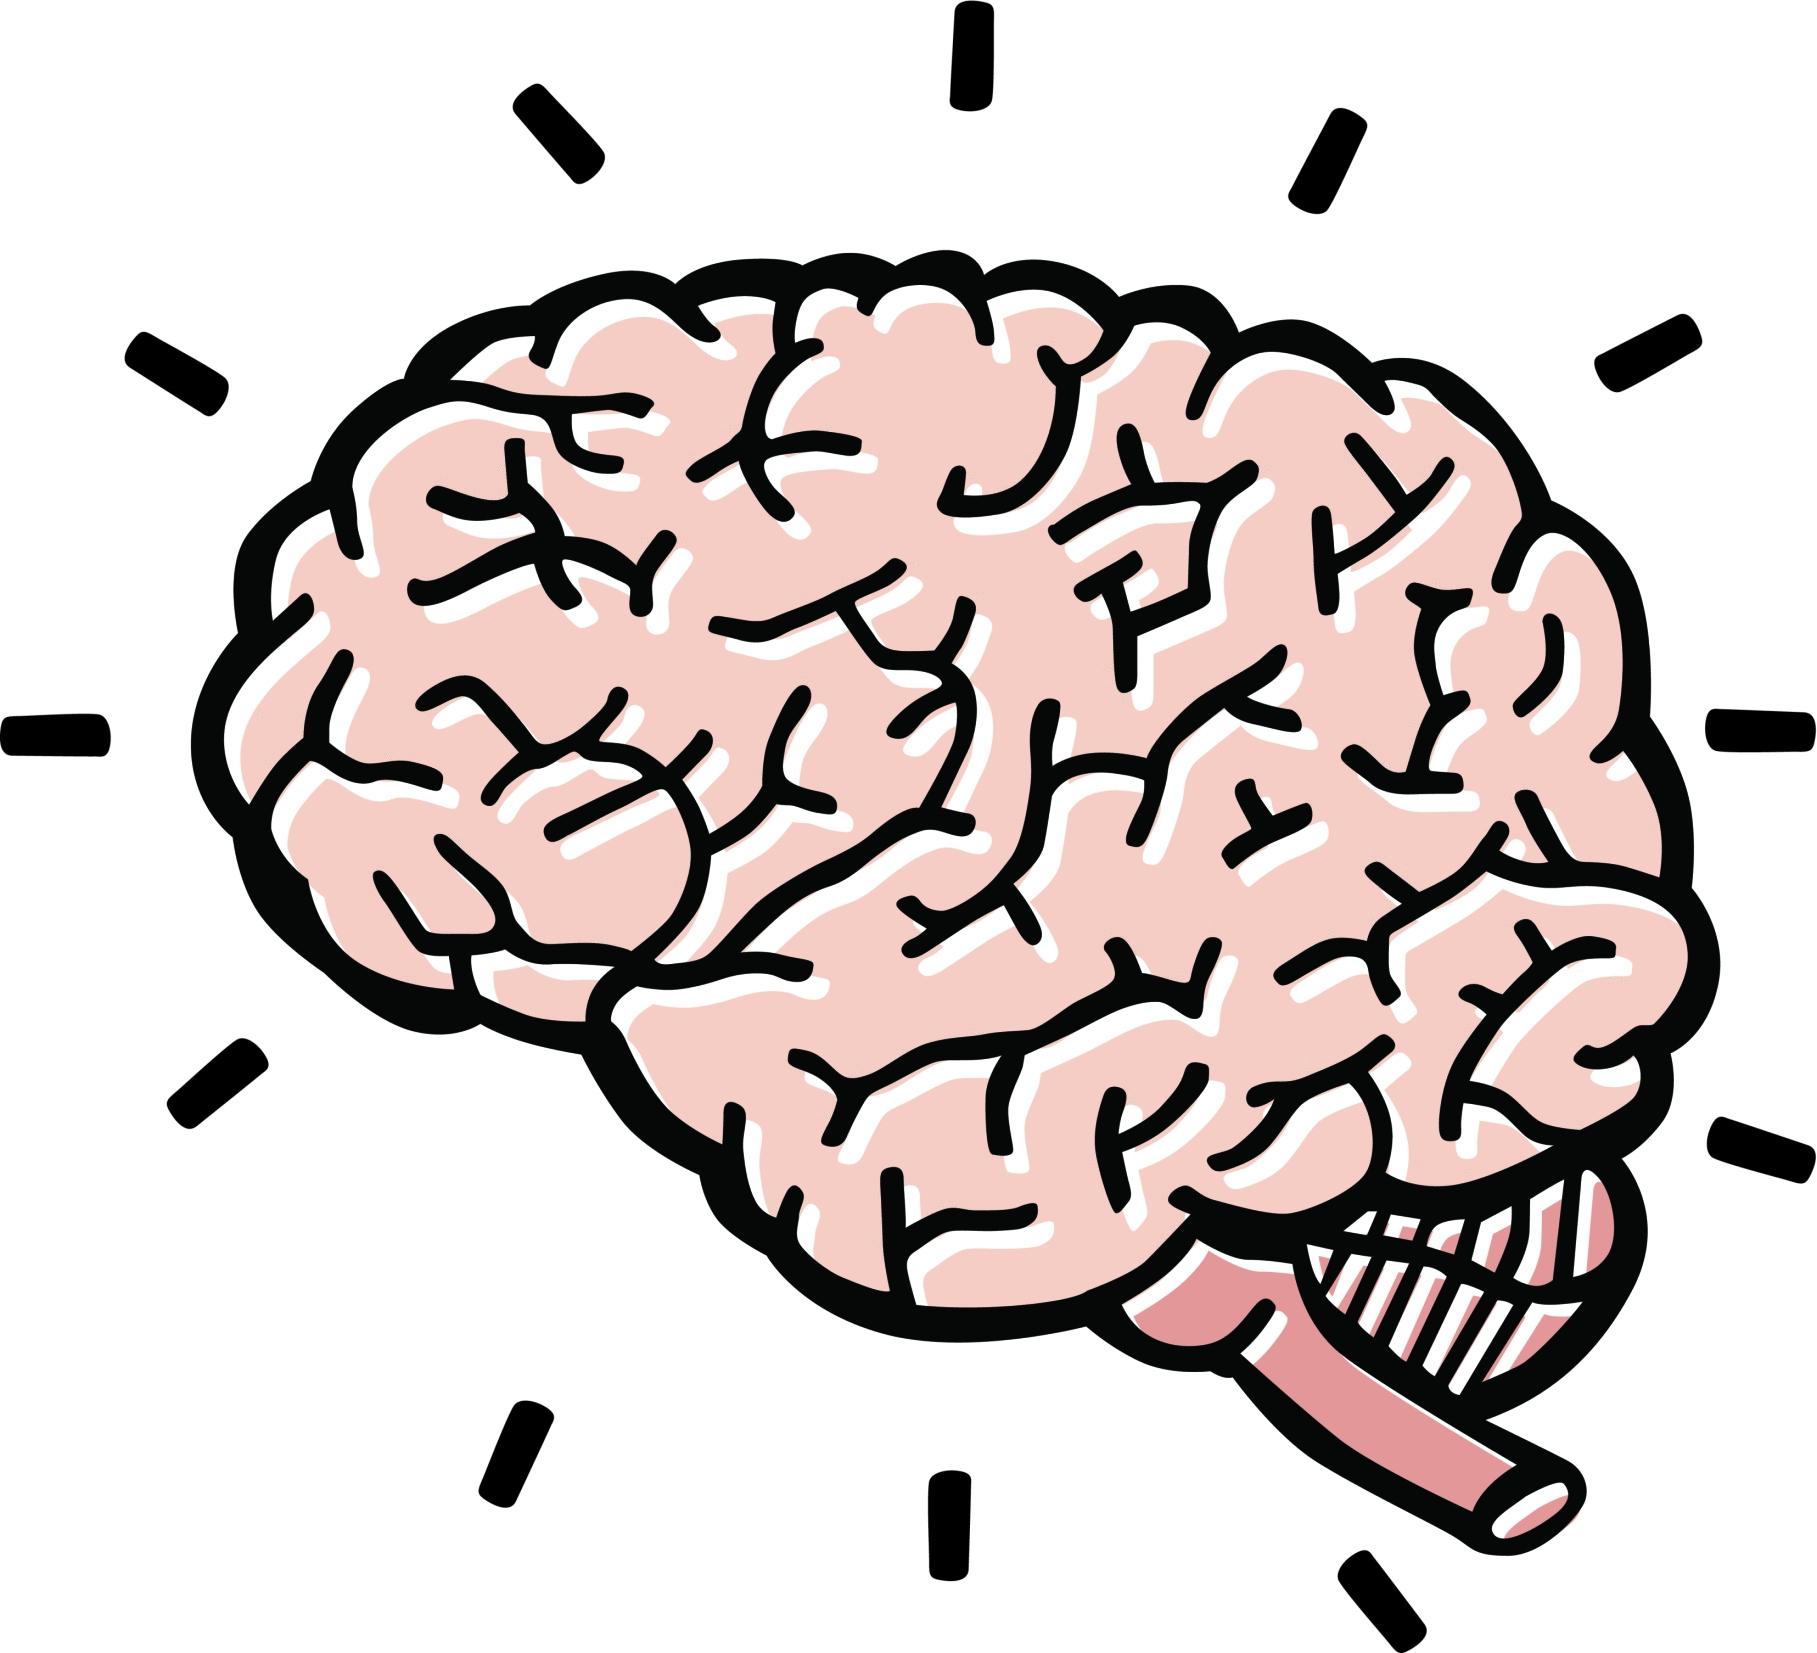 Free Cute Brain Cliparts, Download Free Clip Art, Free Clip.